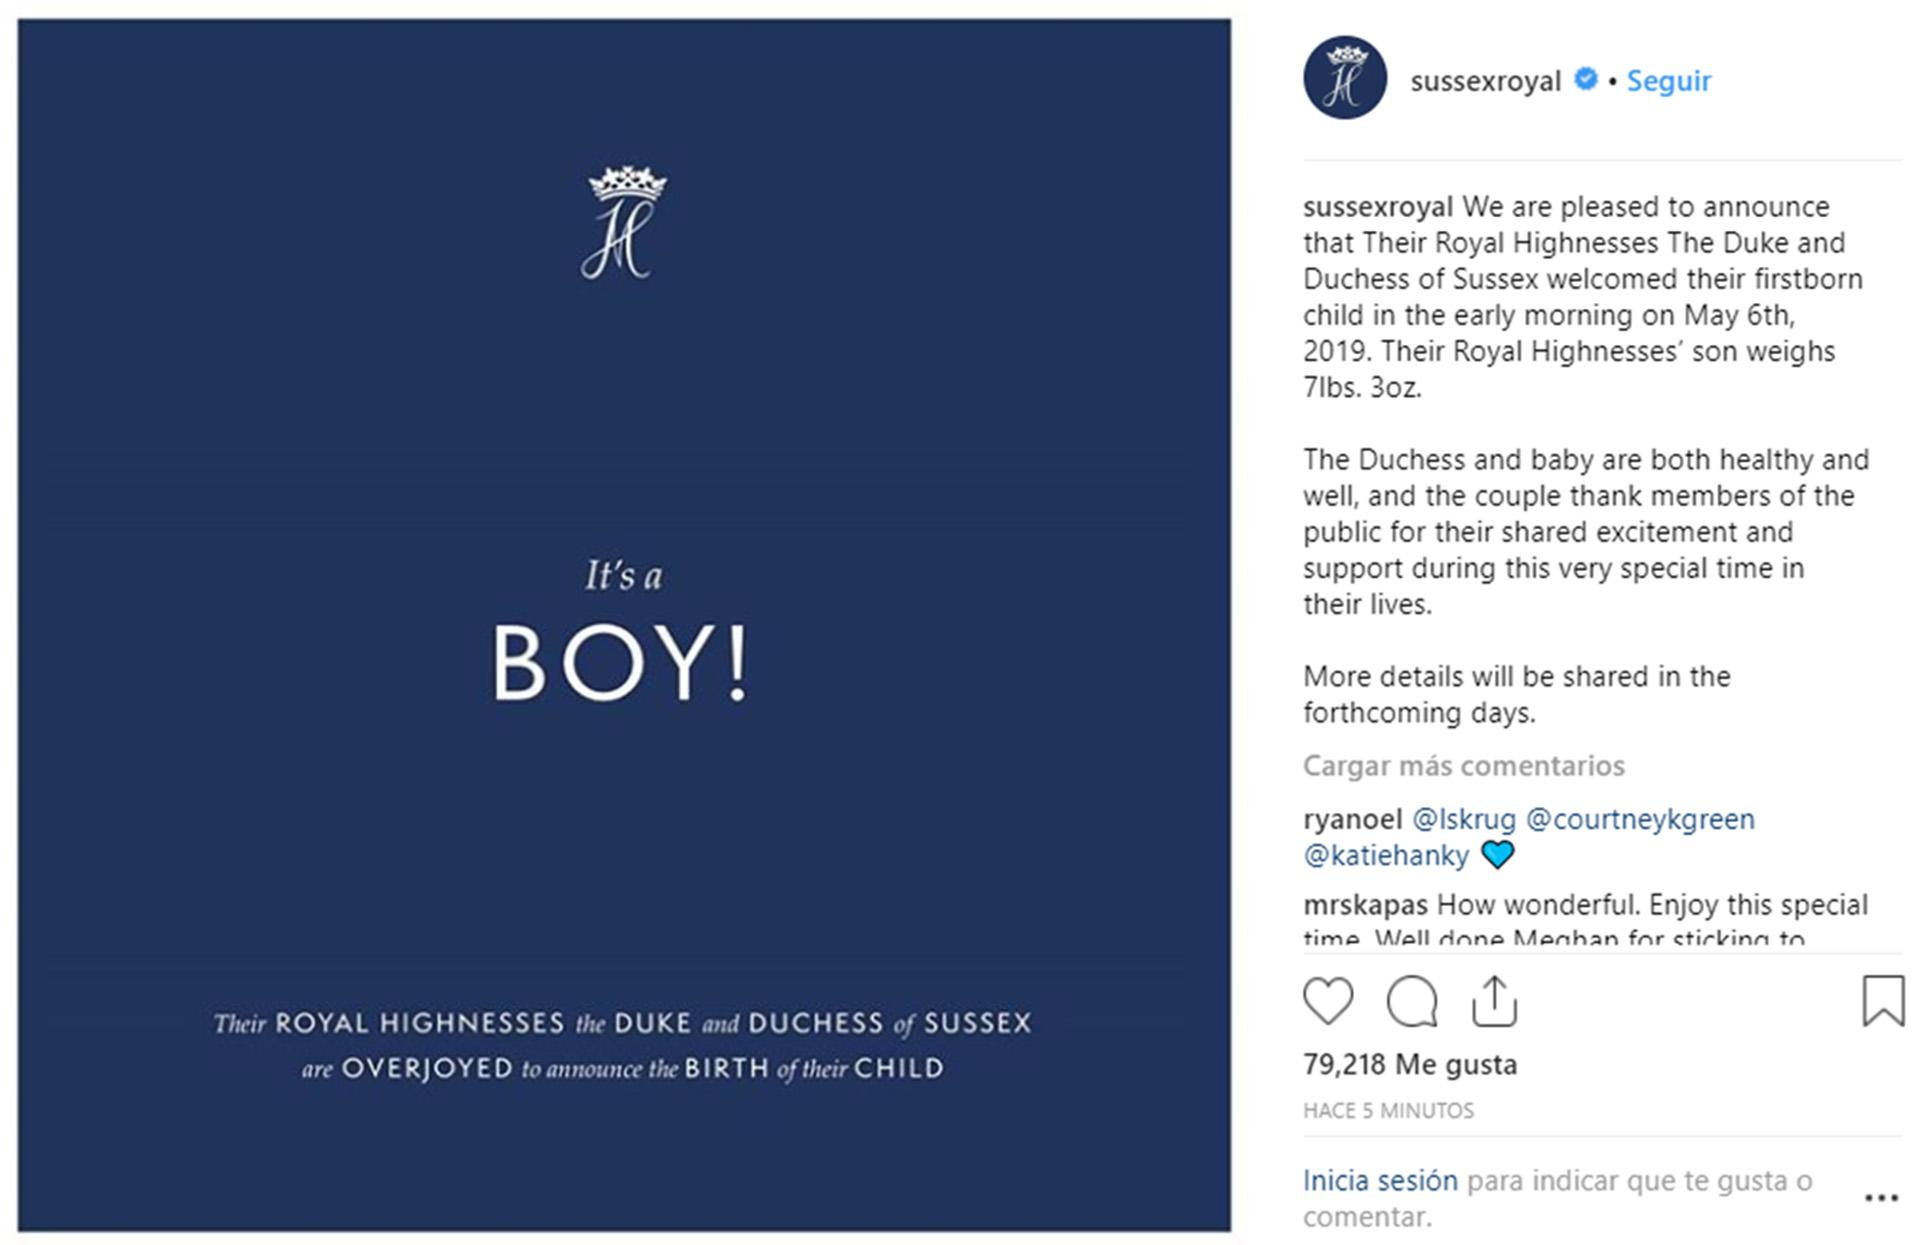 Principe Harry - Meghan Markle Nacimiento - hijo - bebe - real